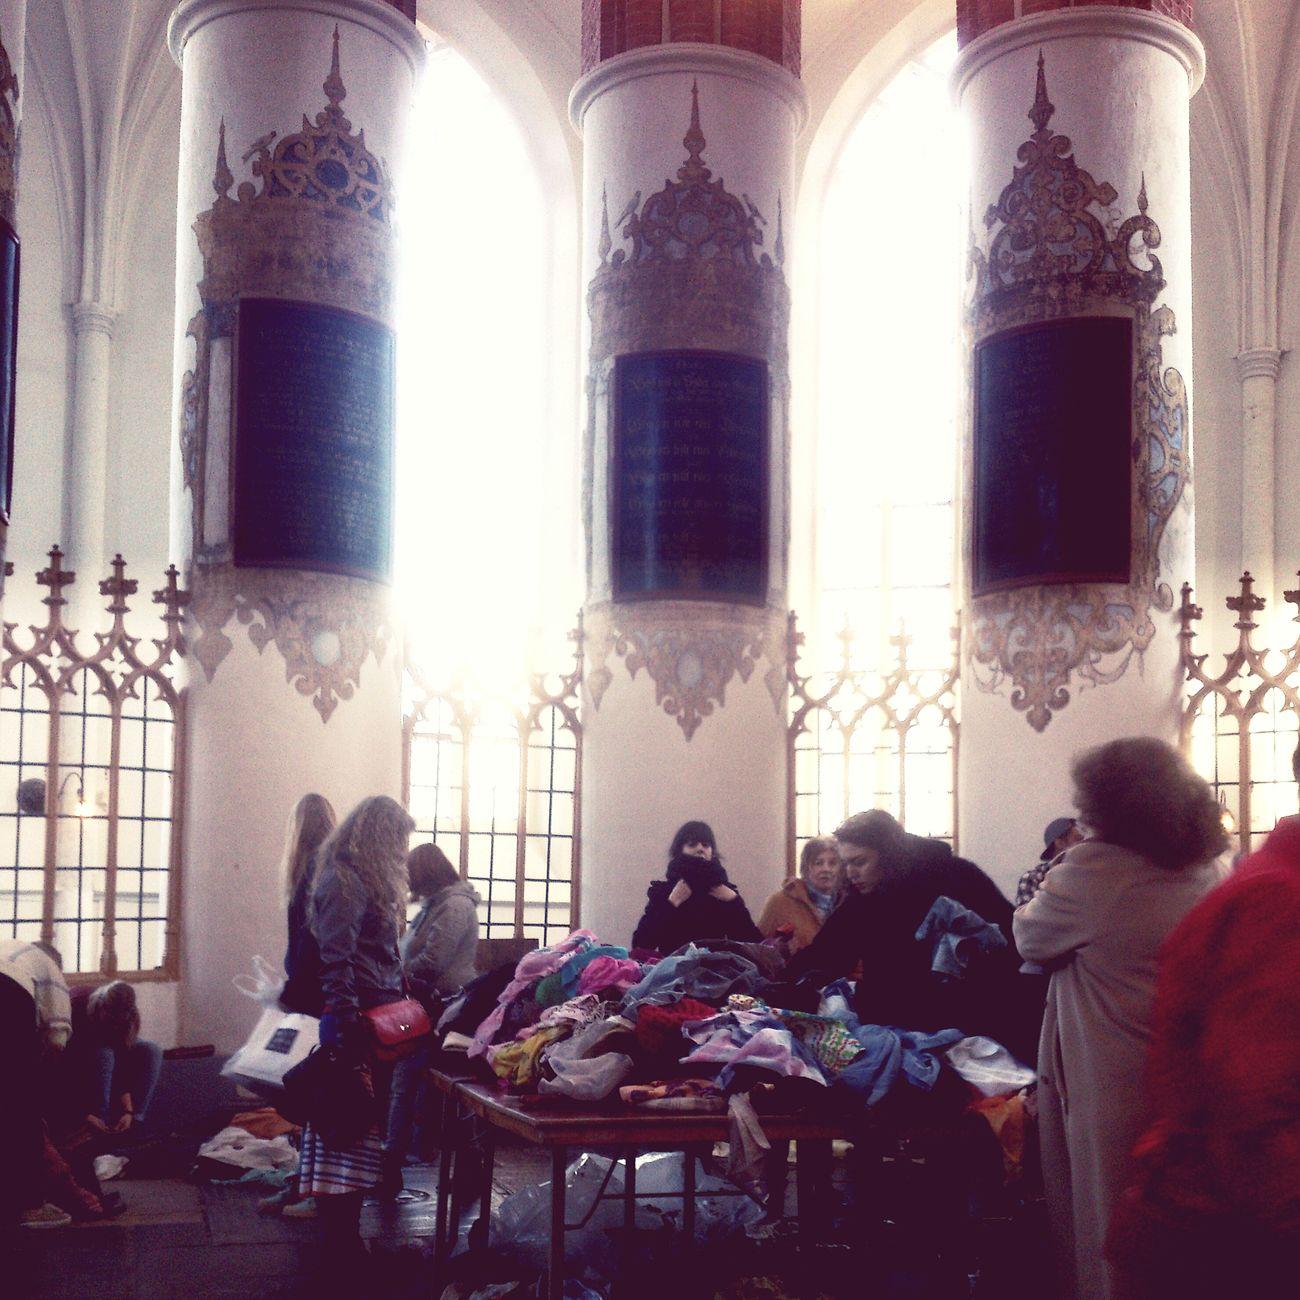 Vintage Fashion Vintage Shopping Vintage Going To Market Church Sunday Funday Vintage Clothing Clothing